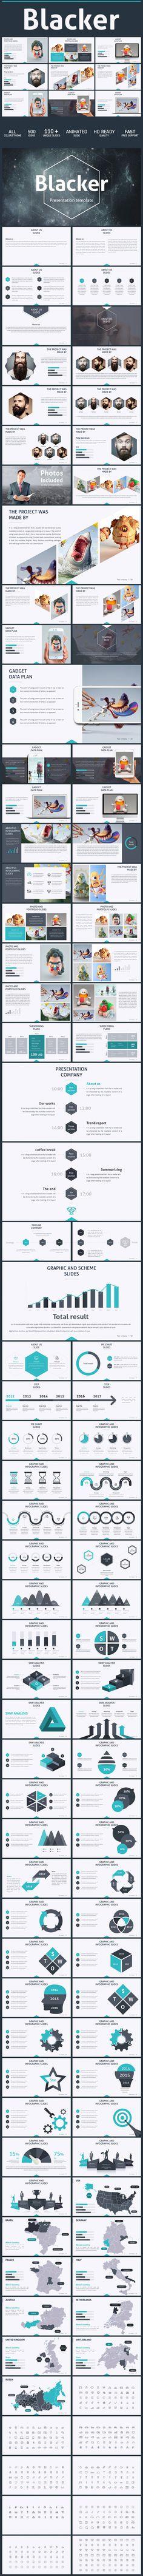 Blacker creative presentation - Creative PowerPoint Templates